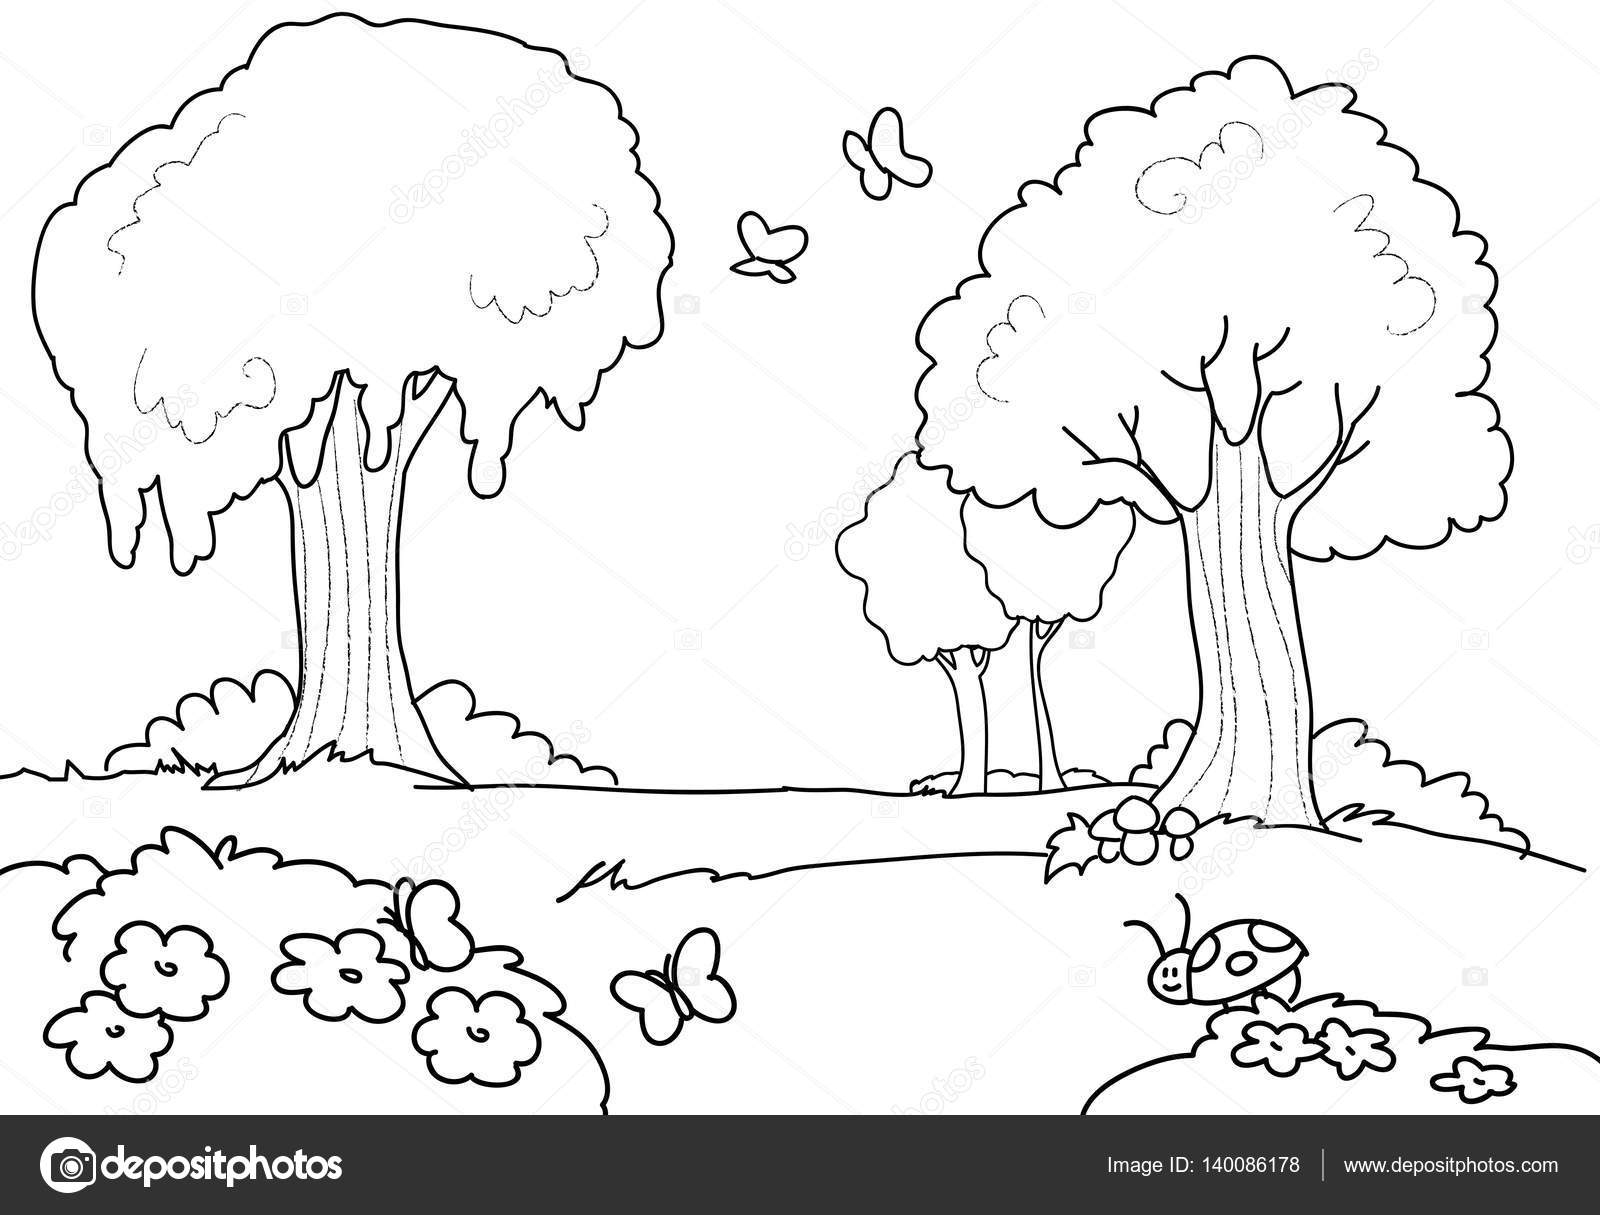 Dibujos Arbustos Para Colorear Dibujos Animados De Madera Para